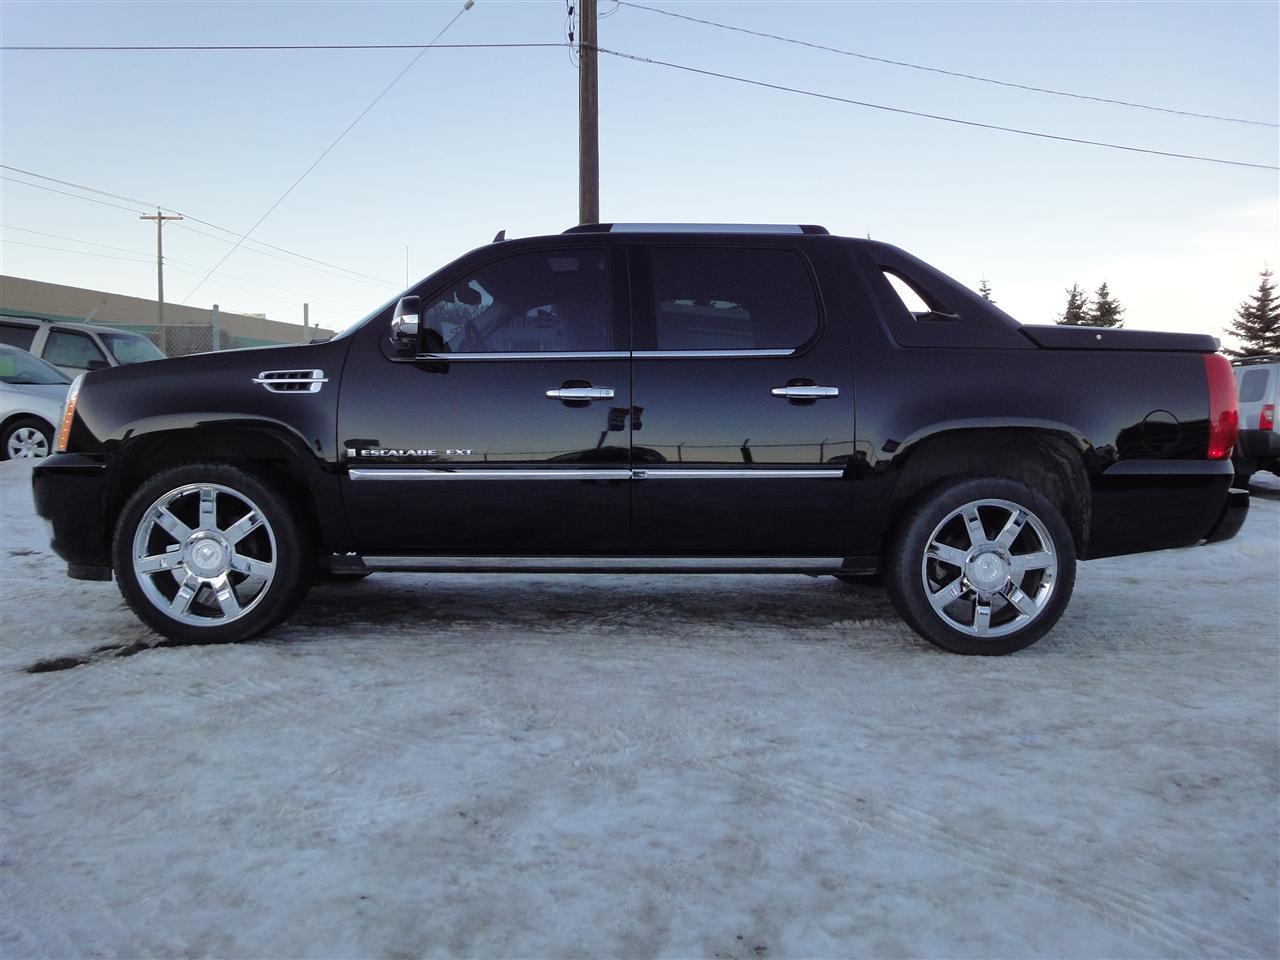 2008 Cadillac Escalade Ext Information And Photos Zombiedrive Wiring Diagrams 15